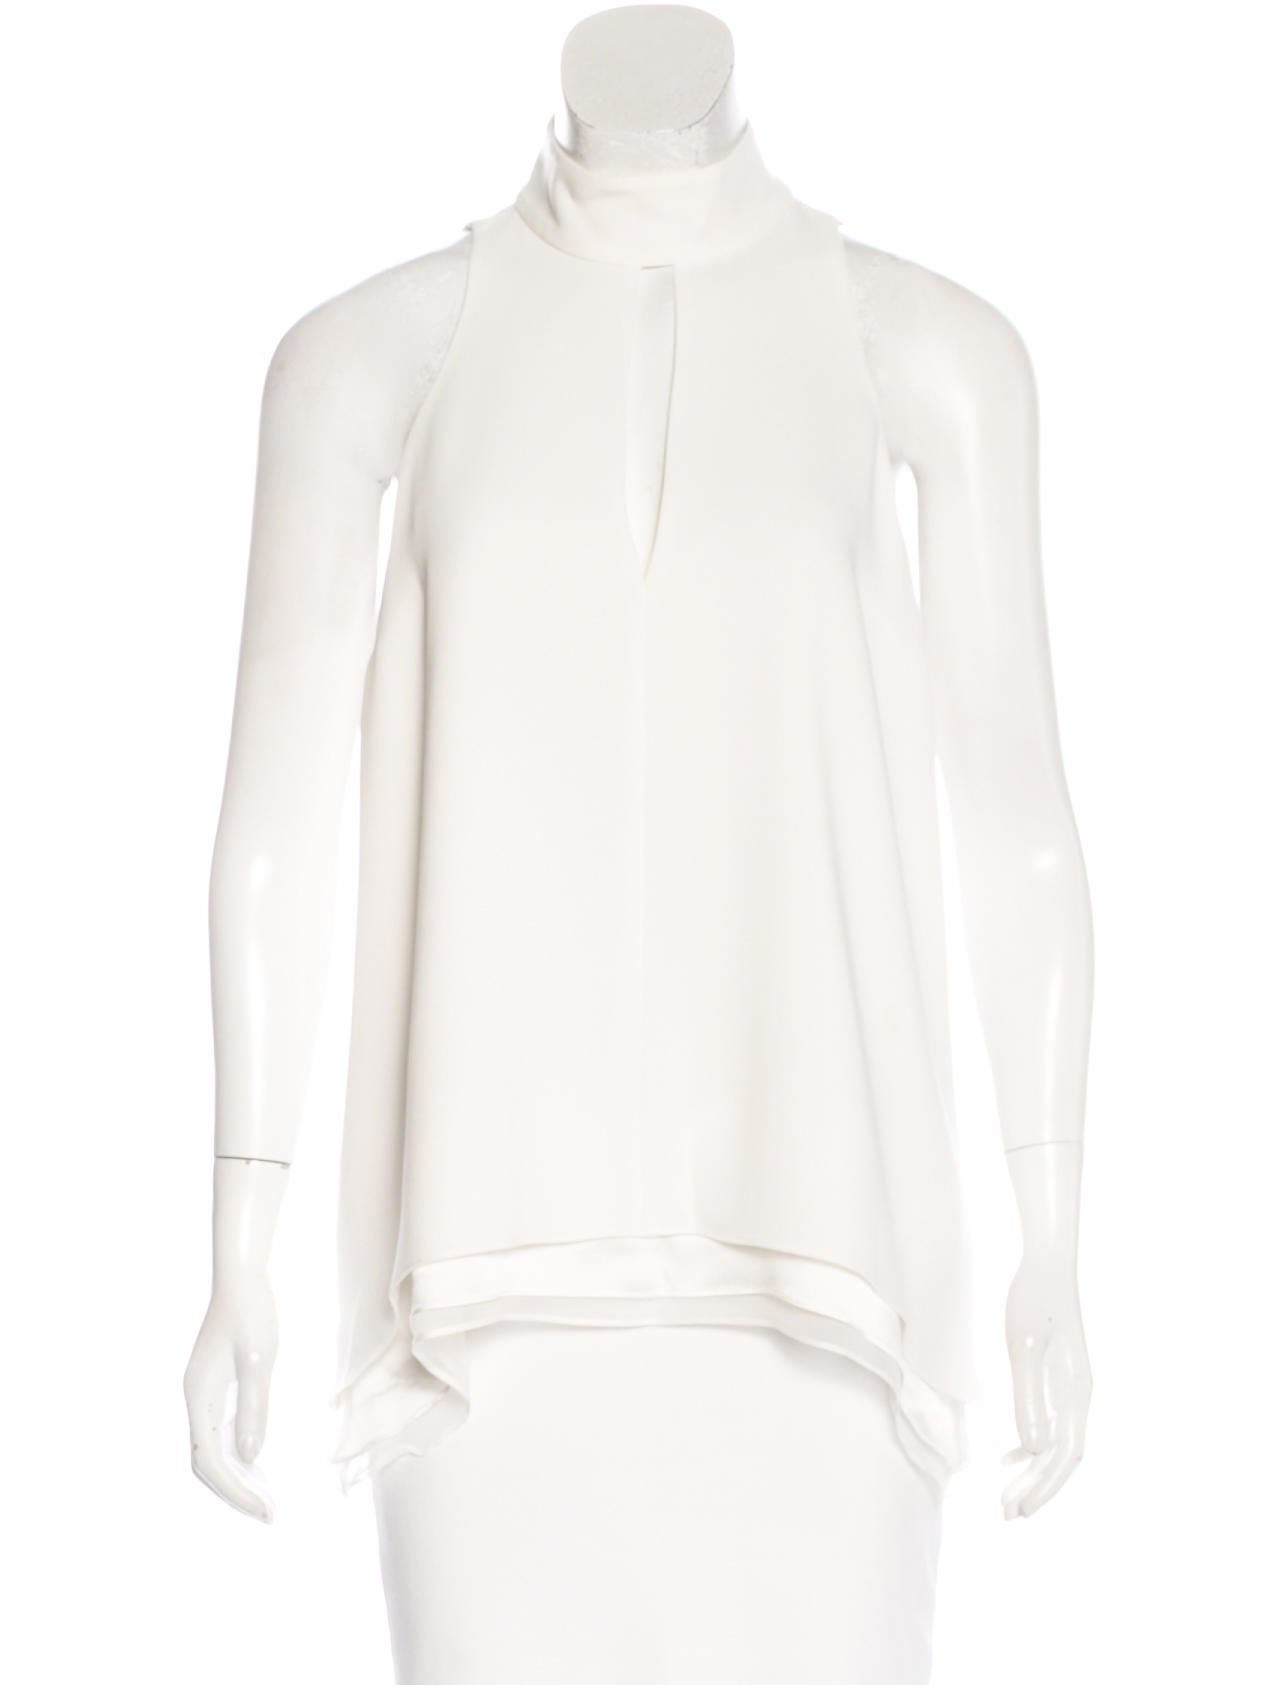 Cinq Sept Mock Neck Sleeveless Top Clothing